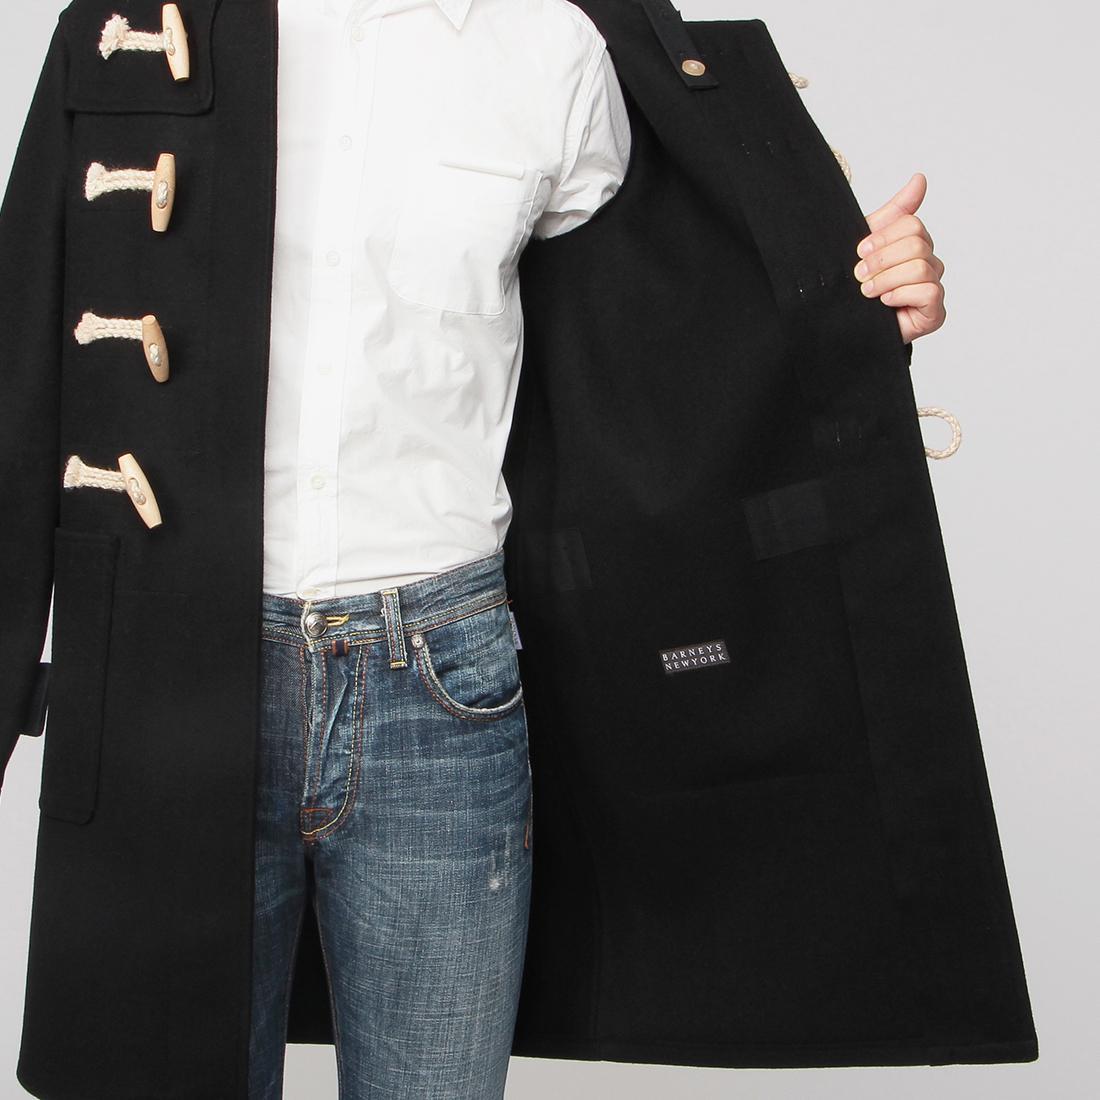 Barneys New York x Glenover Duffle Coat 2002764: Black